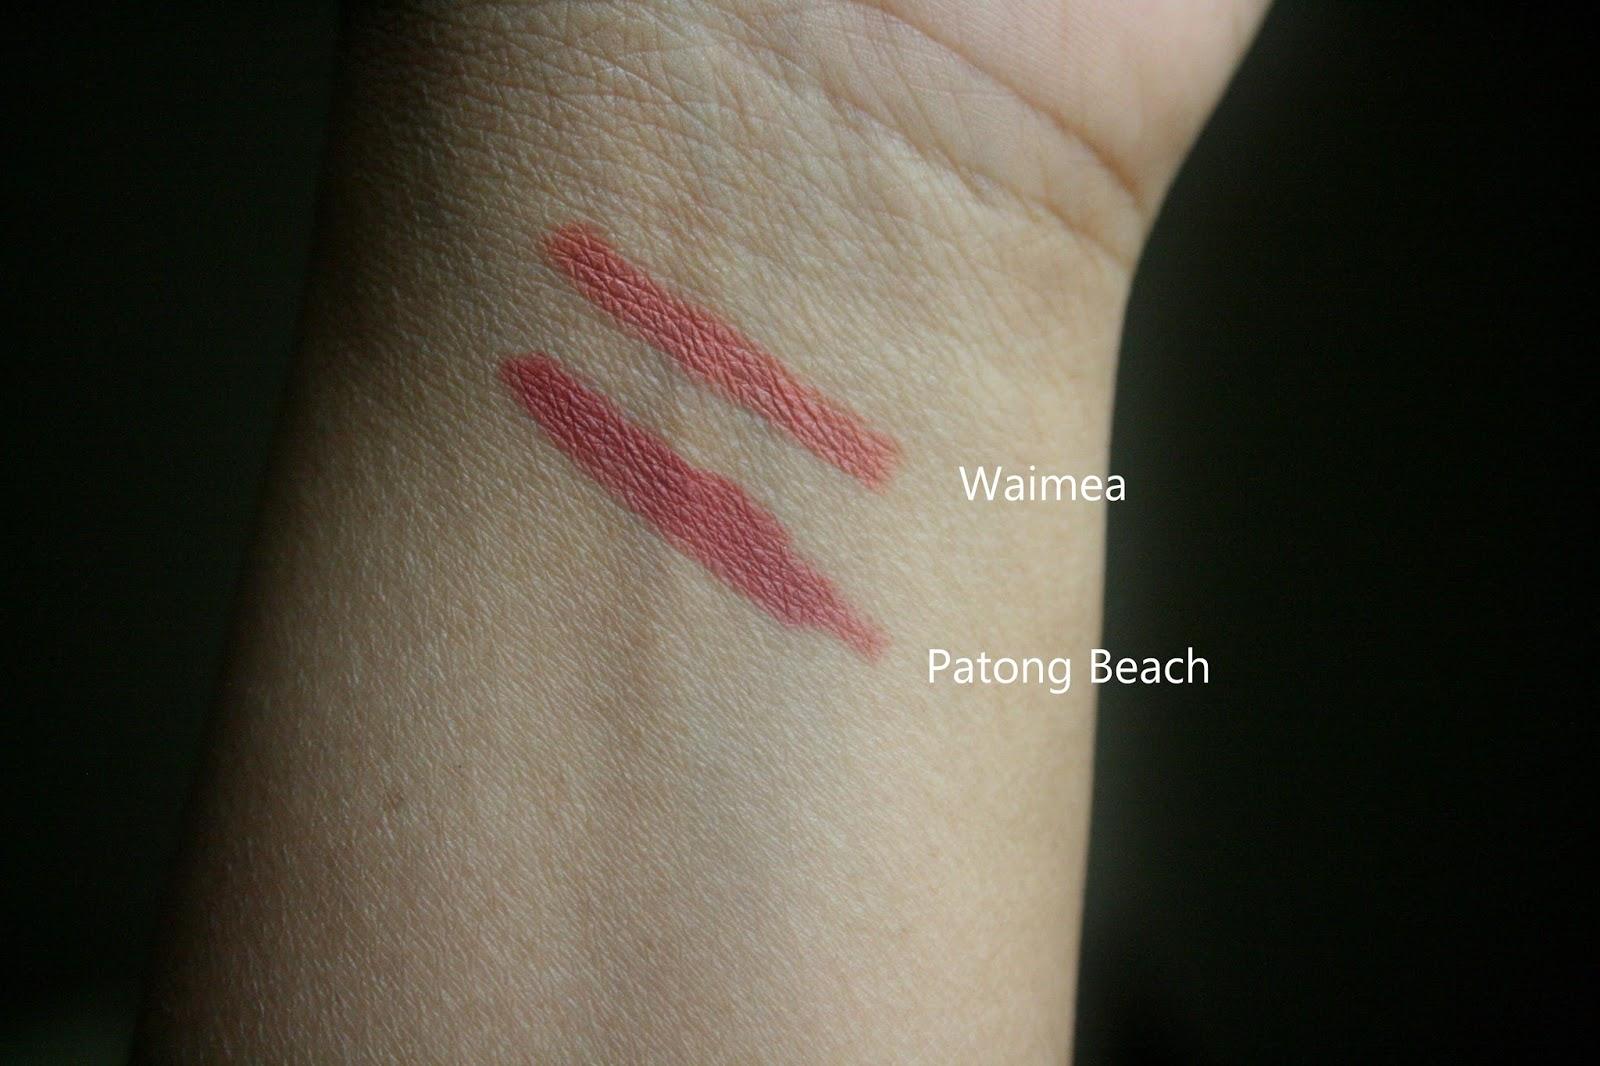 NARS Velvet Lip Liners Waimea and Patong Beach Swatches